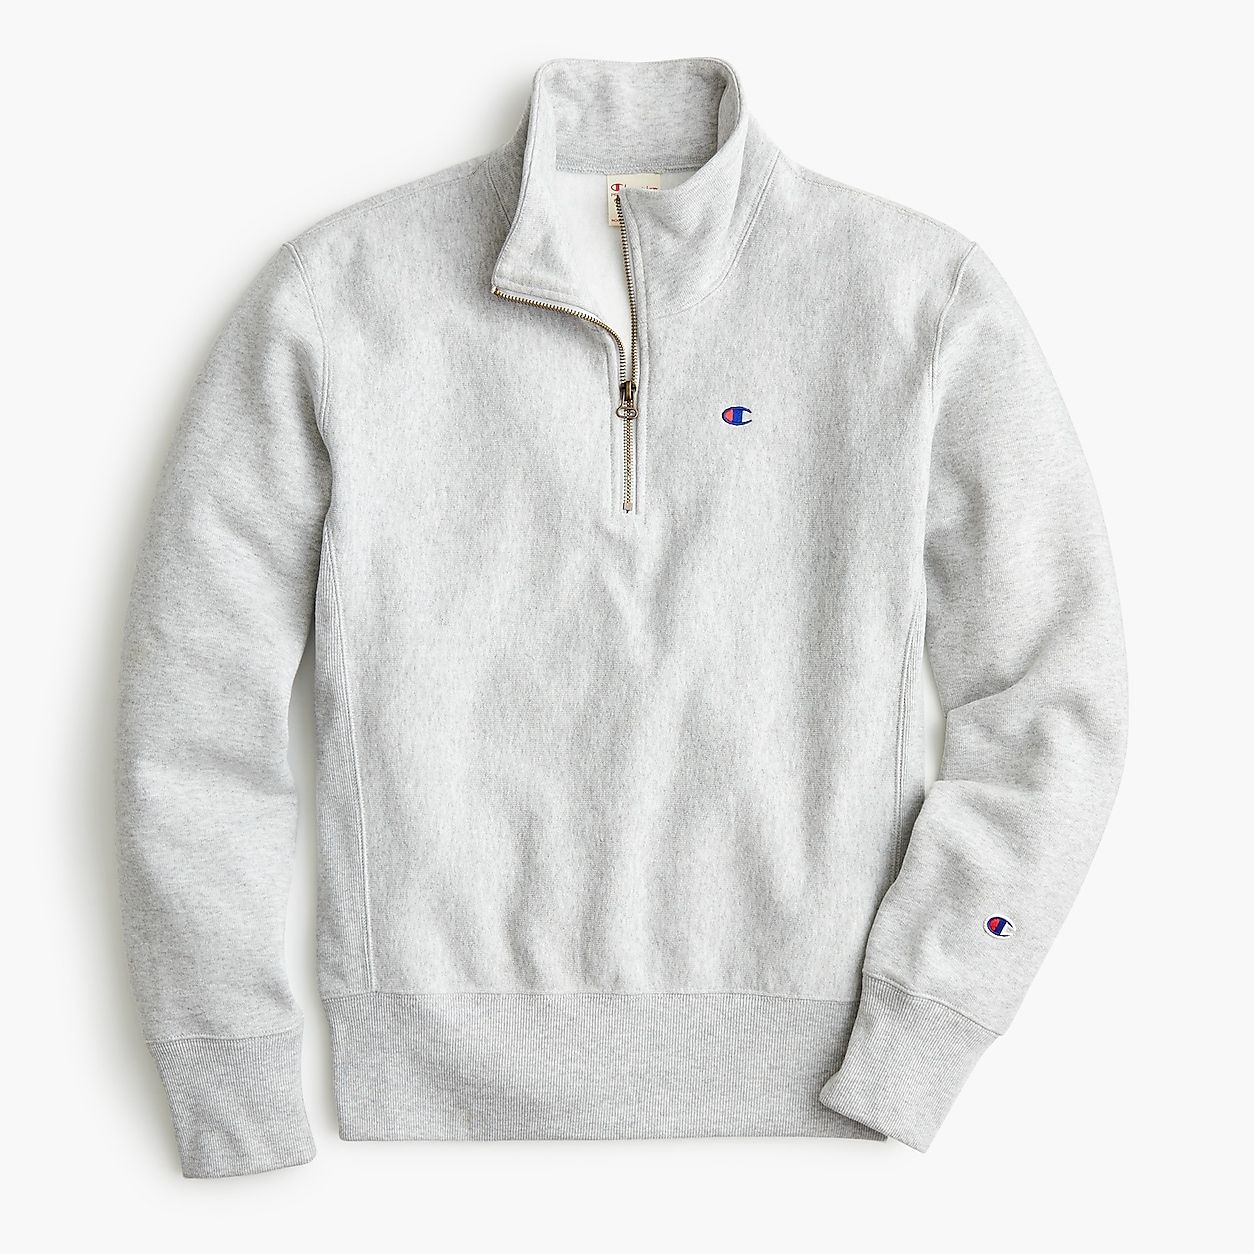 Champion Half Zip Pullover Sweatshirt Pullovers Outfit Half Zip Pullover Quarter Zip Sweatshirt